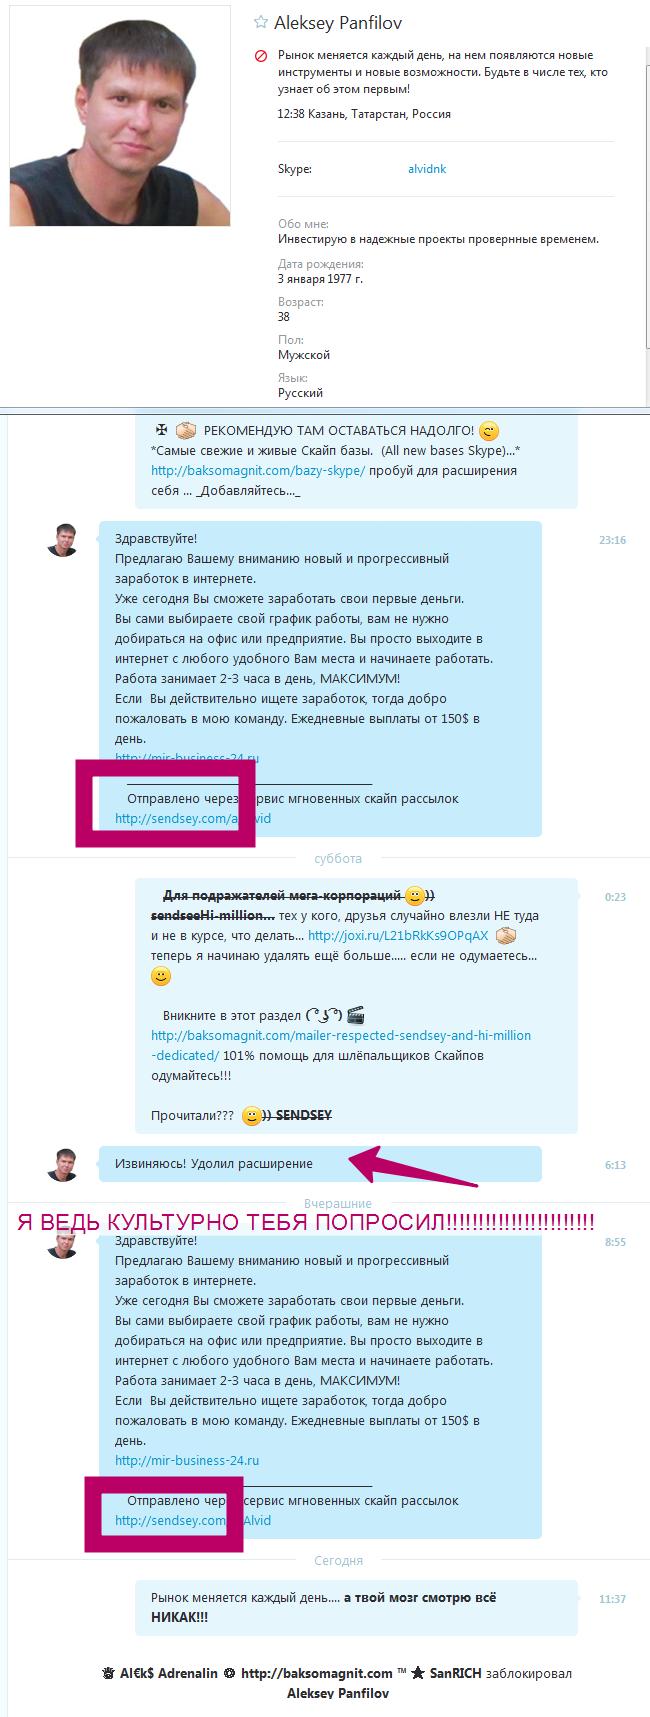 спаммер Алексей Памфилов из Казани скайп alvidnk